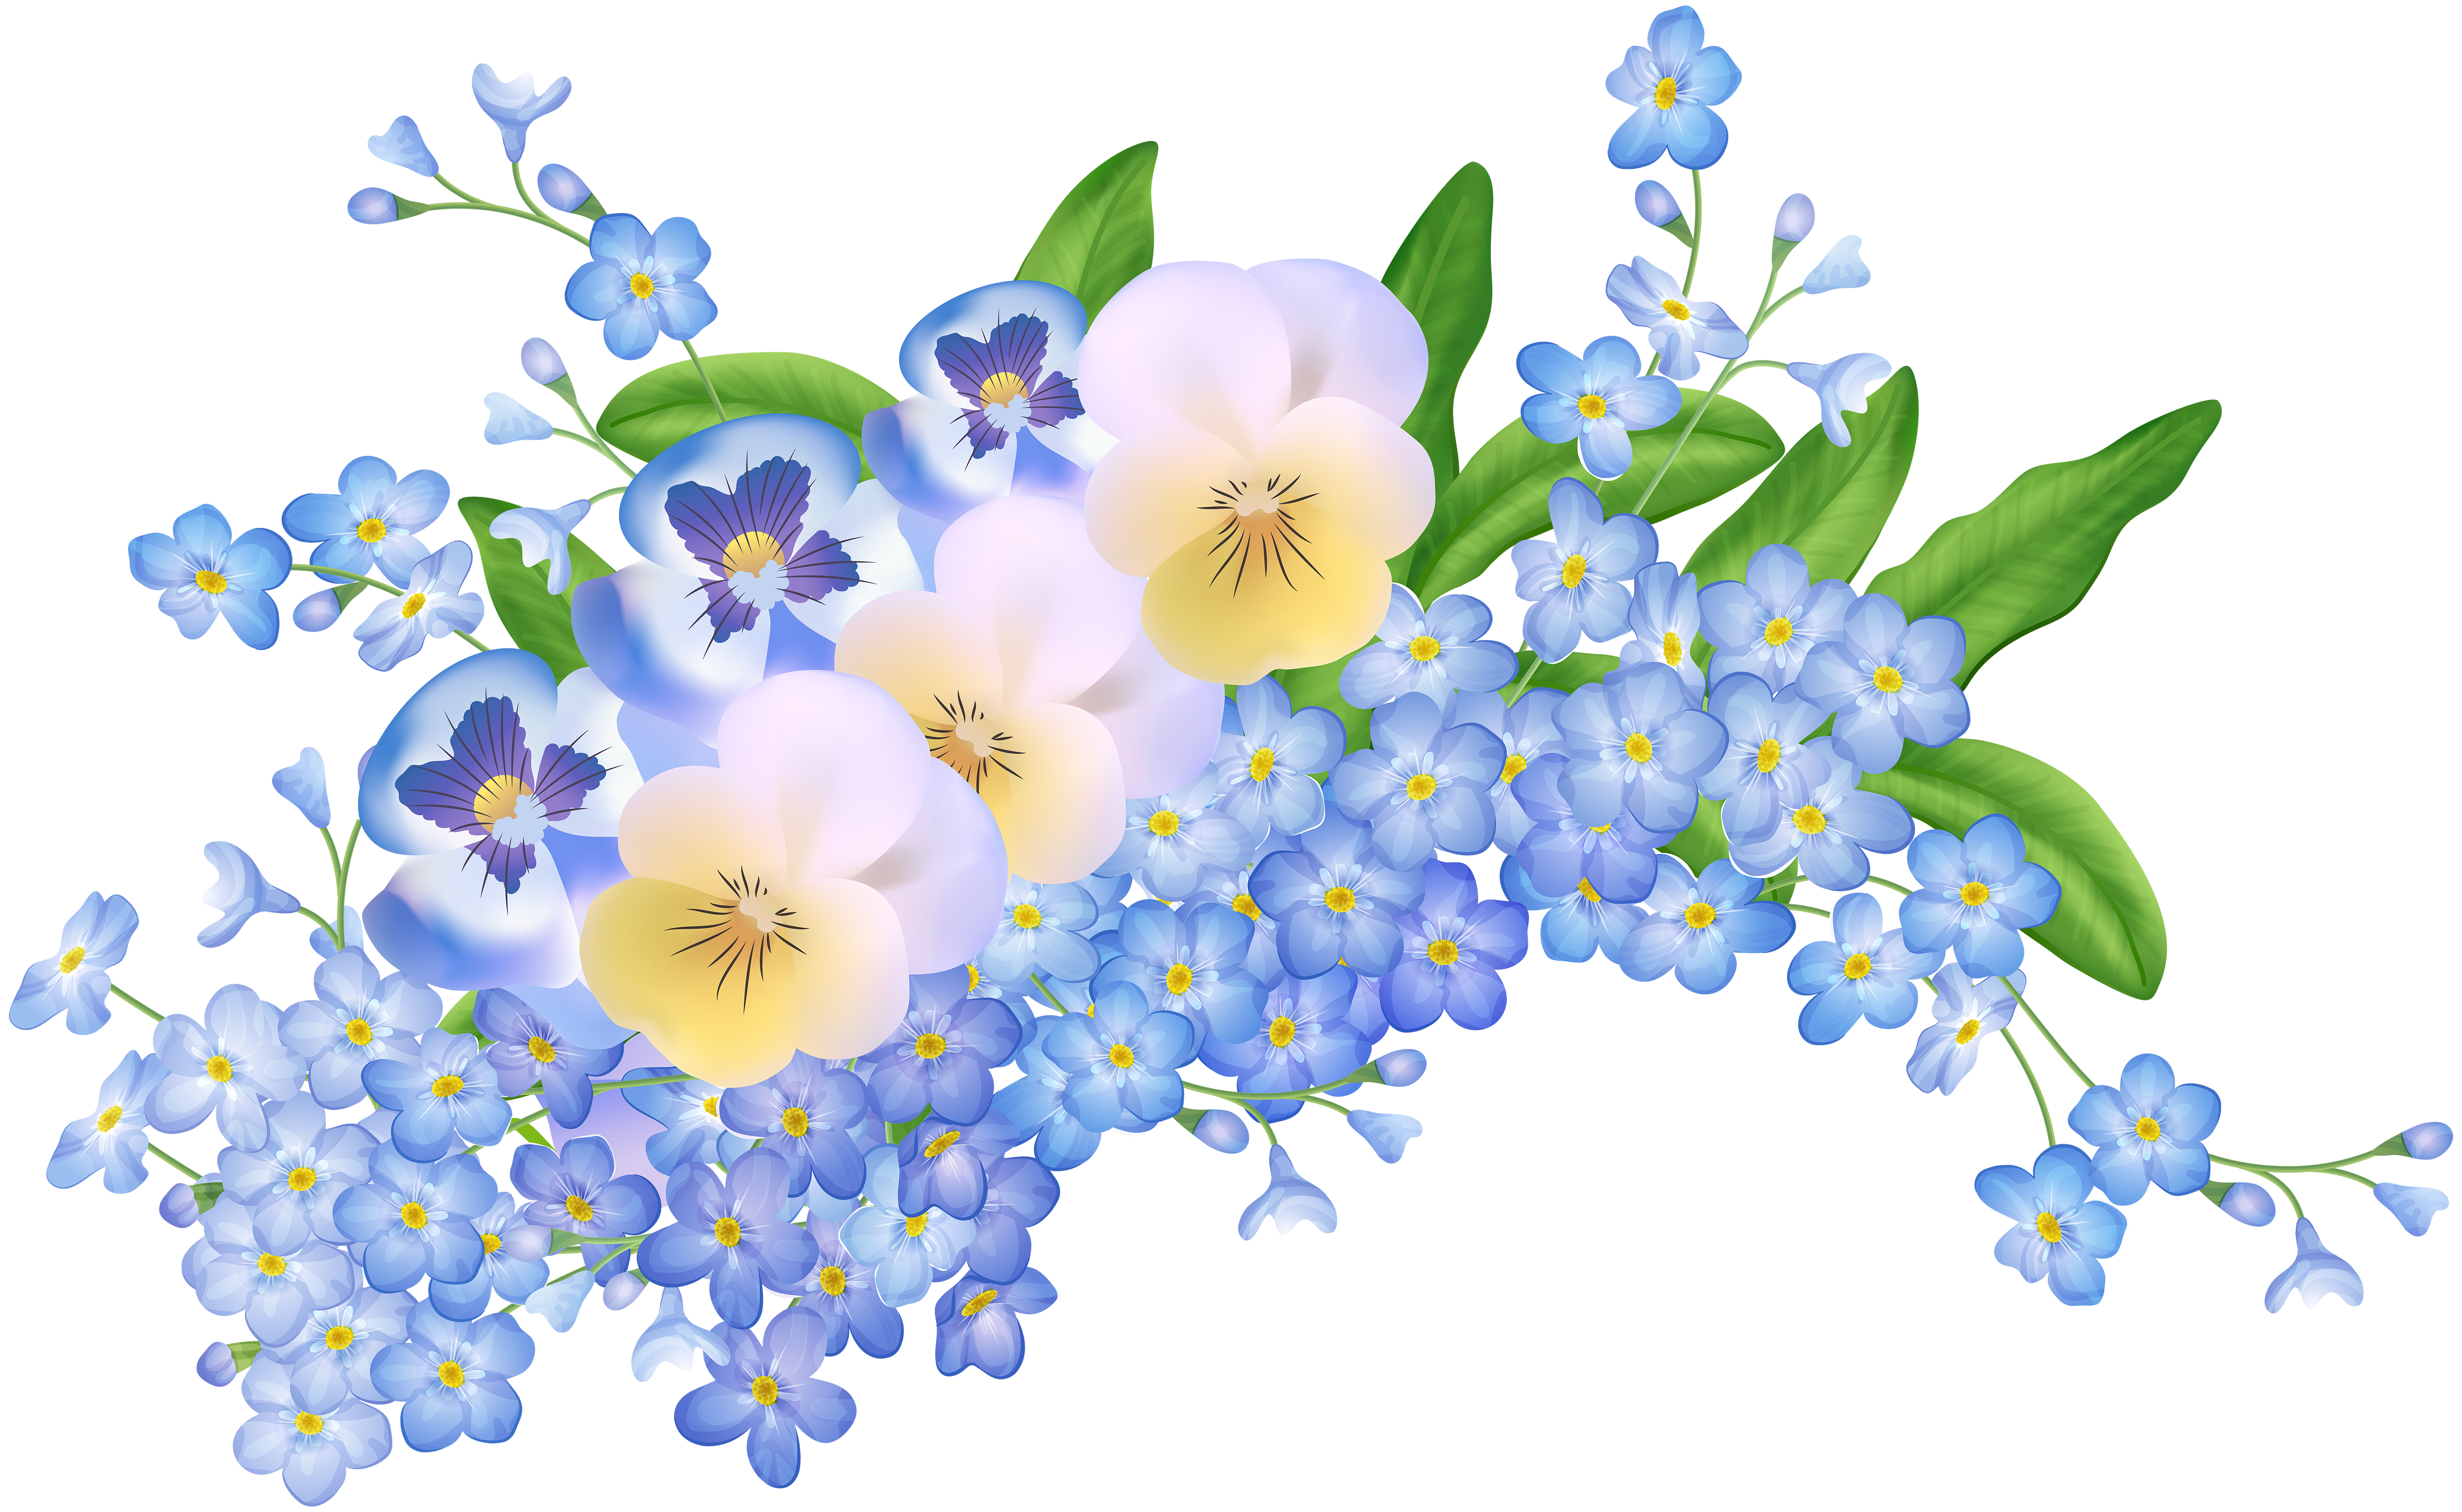 Floral clipart spring. Flowers decoration transparent png